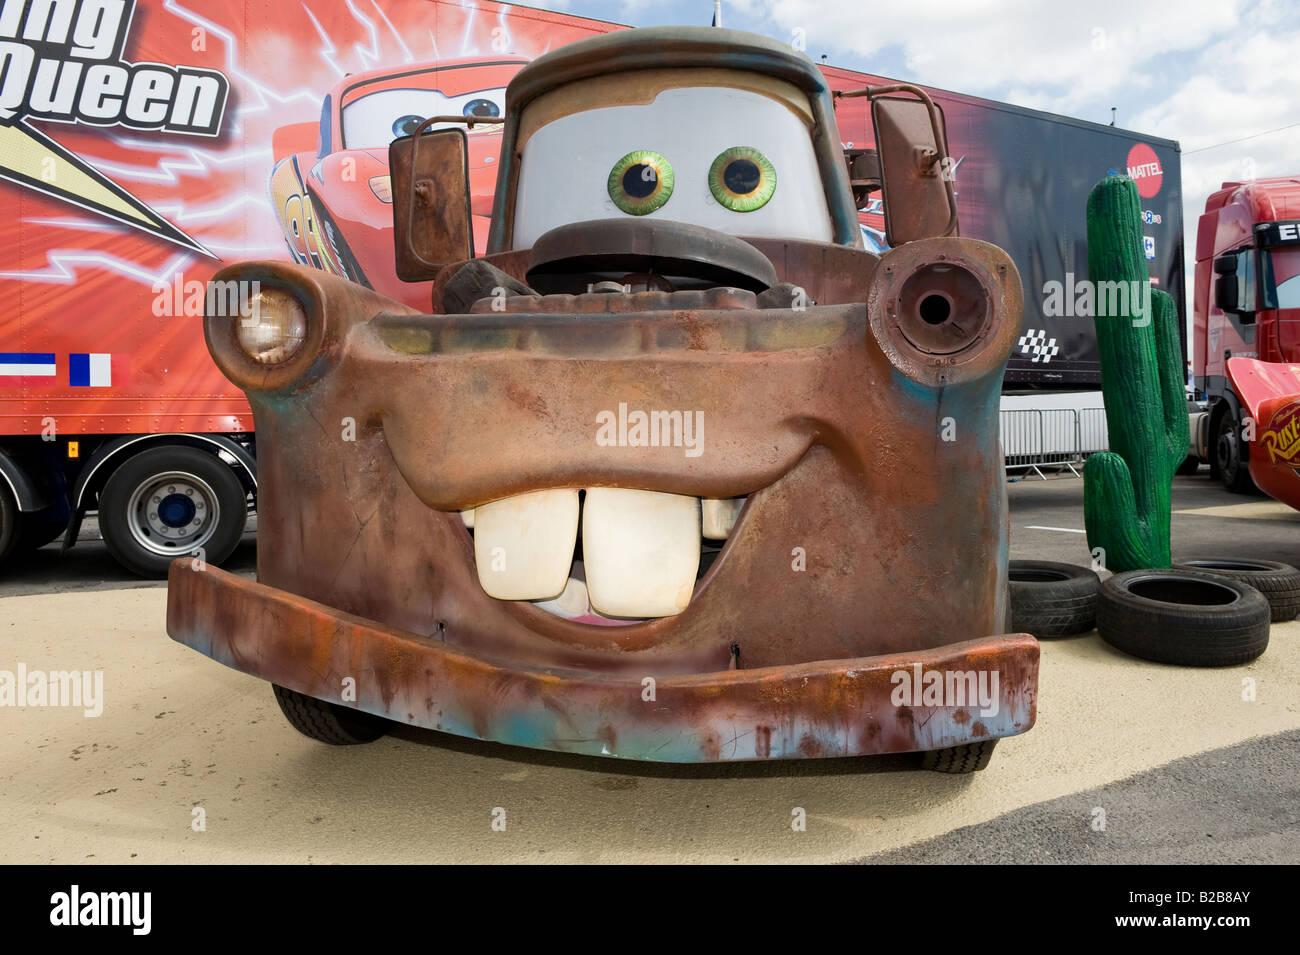 Matar From Disney Pixar Cars Film Stock Photo 18687731 Alamy